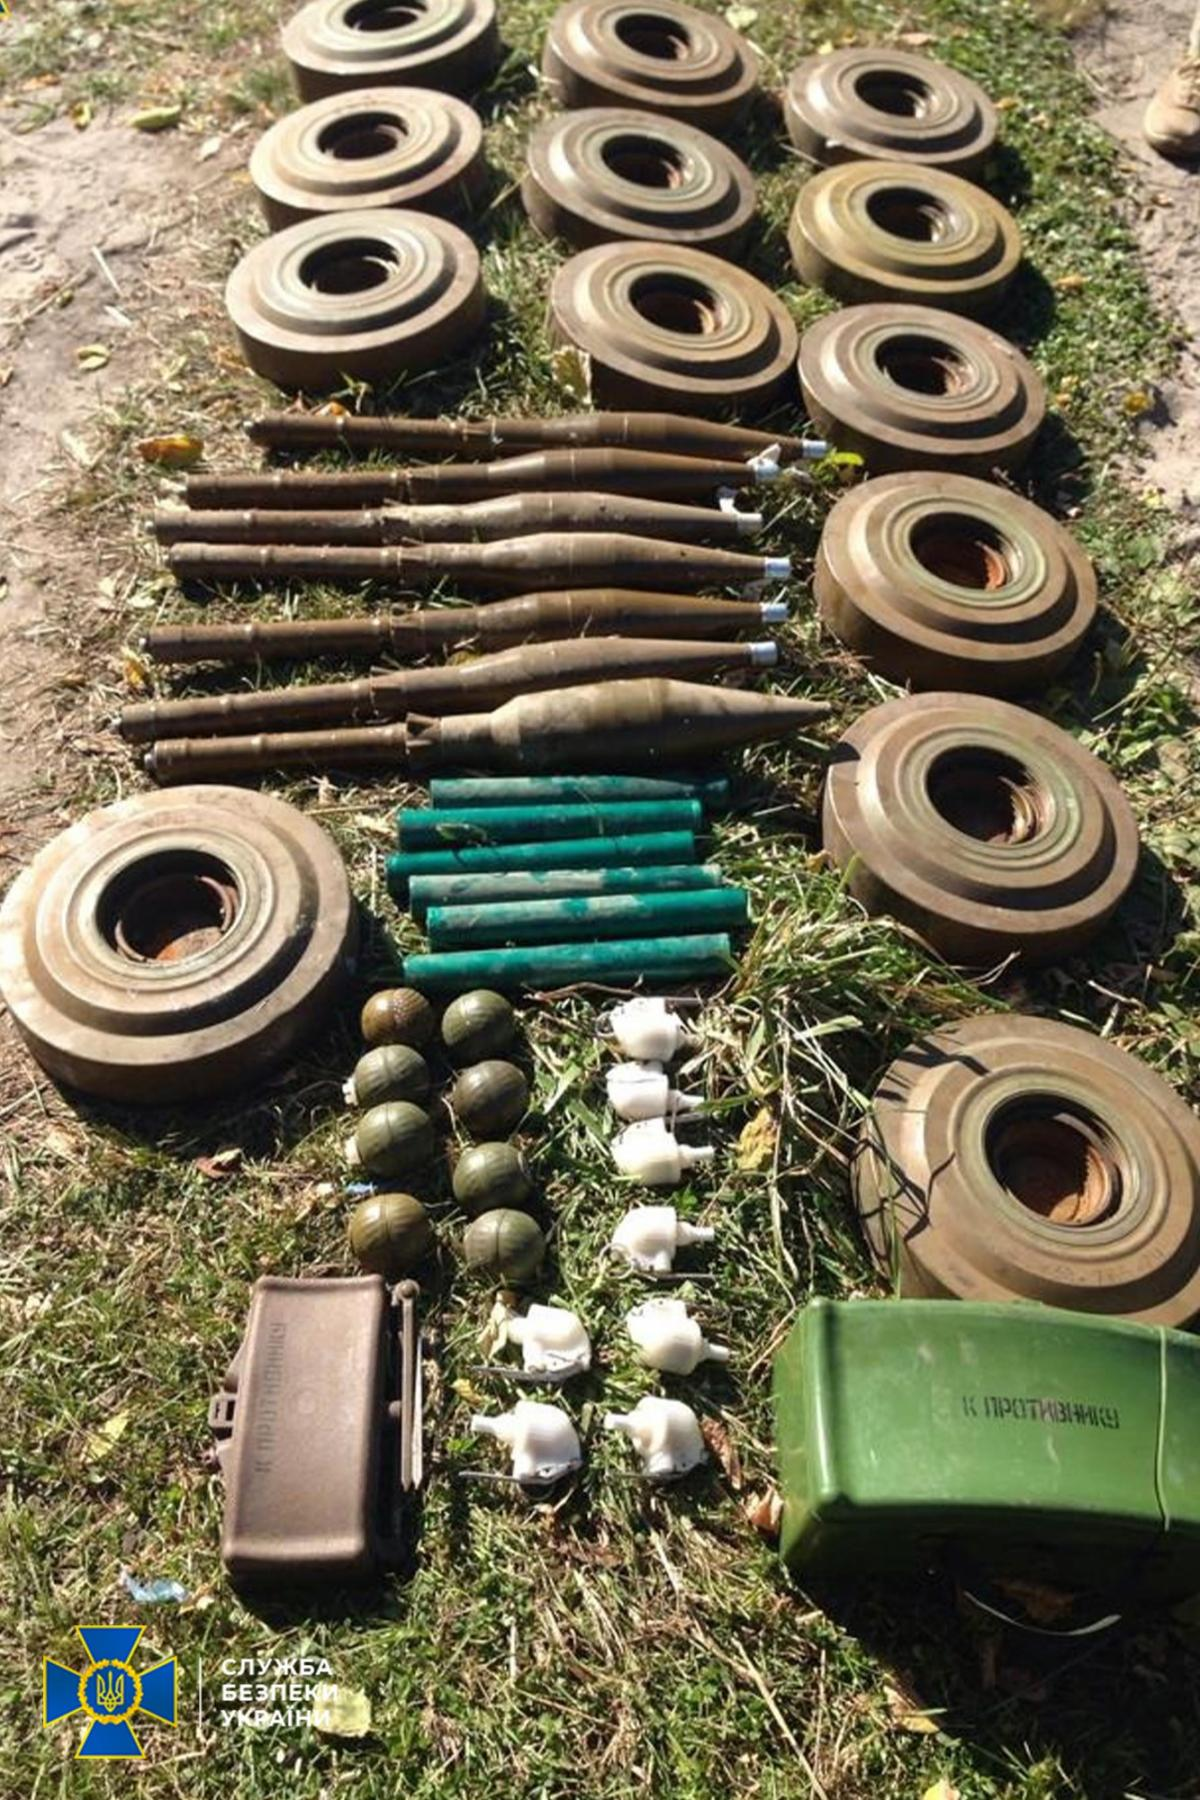 Во время осмотра тайника правоохранители изъяли13 противотанковых мин ТМ - 62м \ фото СБУ